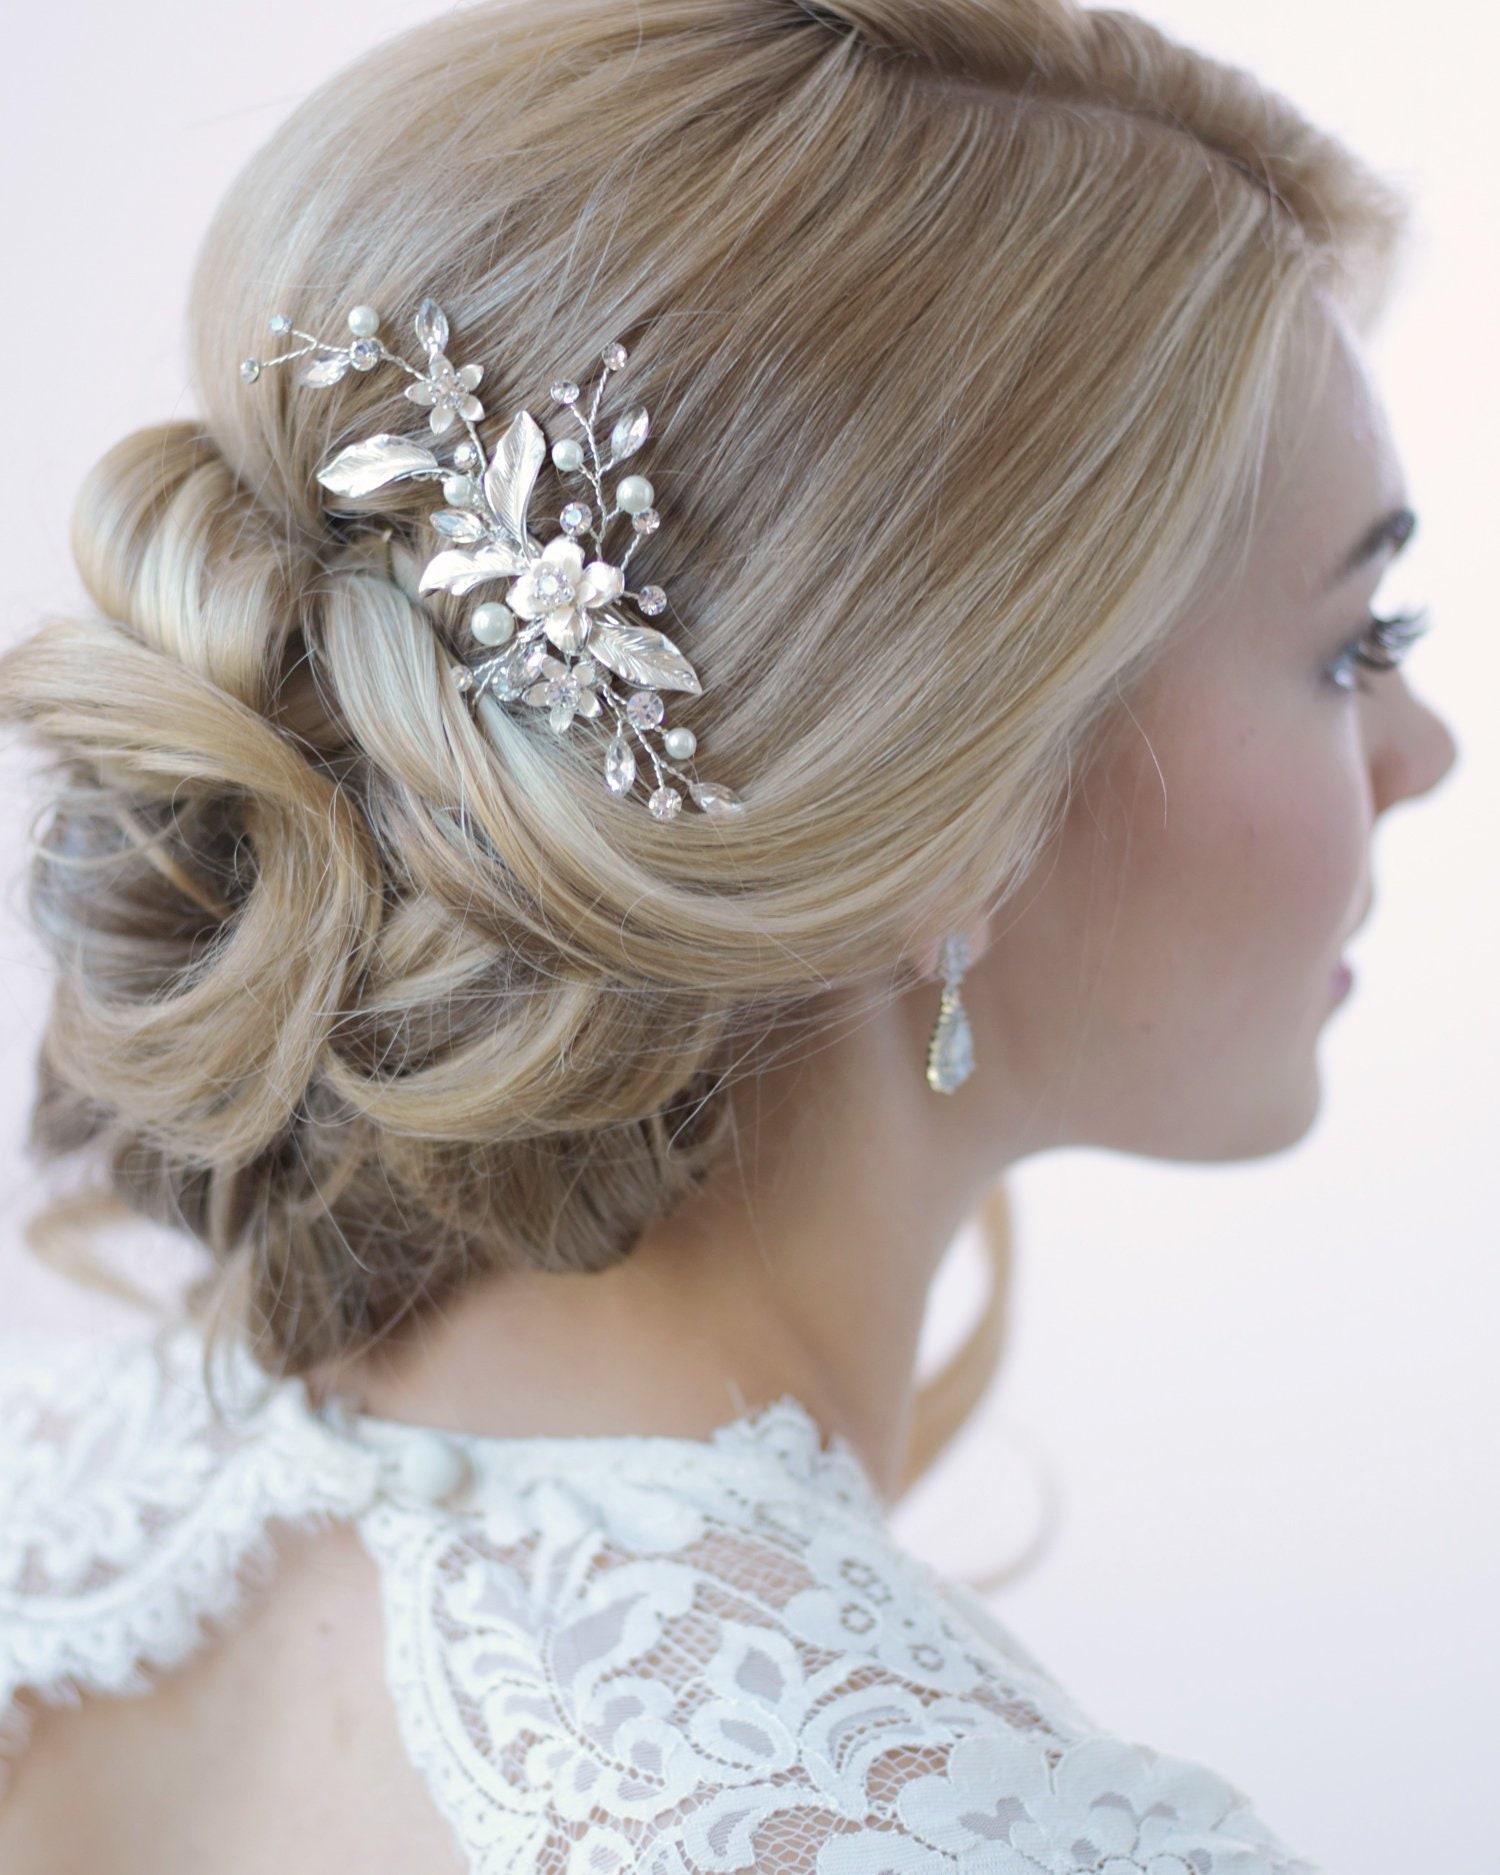 20 x 6cm Handmade Flower Crystal Pearl Bridal Head Pieces Hair Clip Accessories